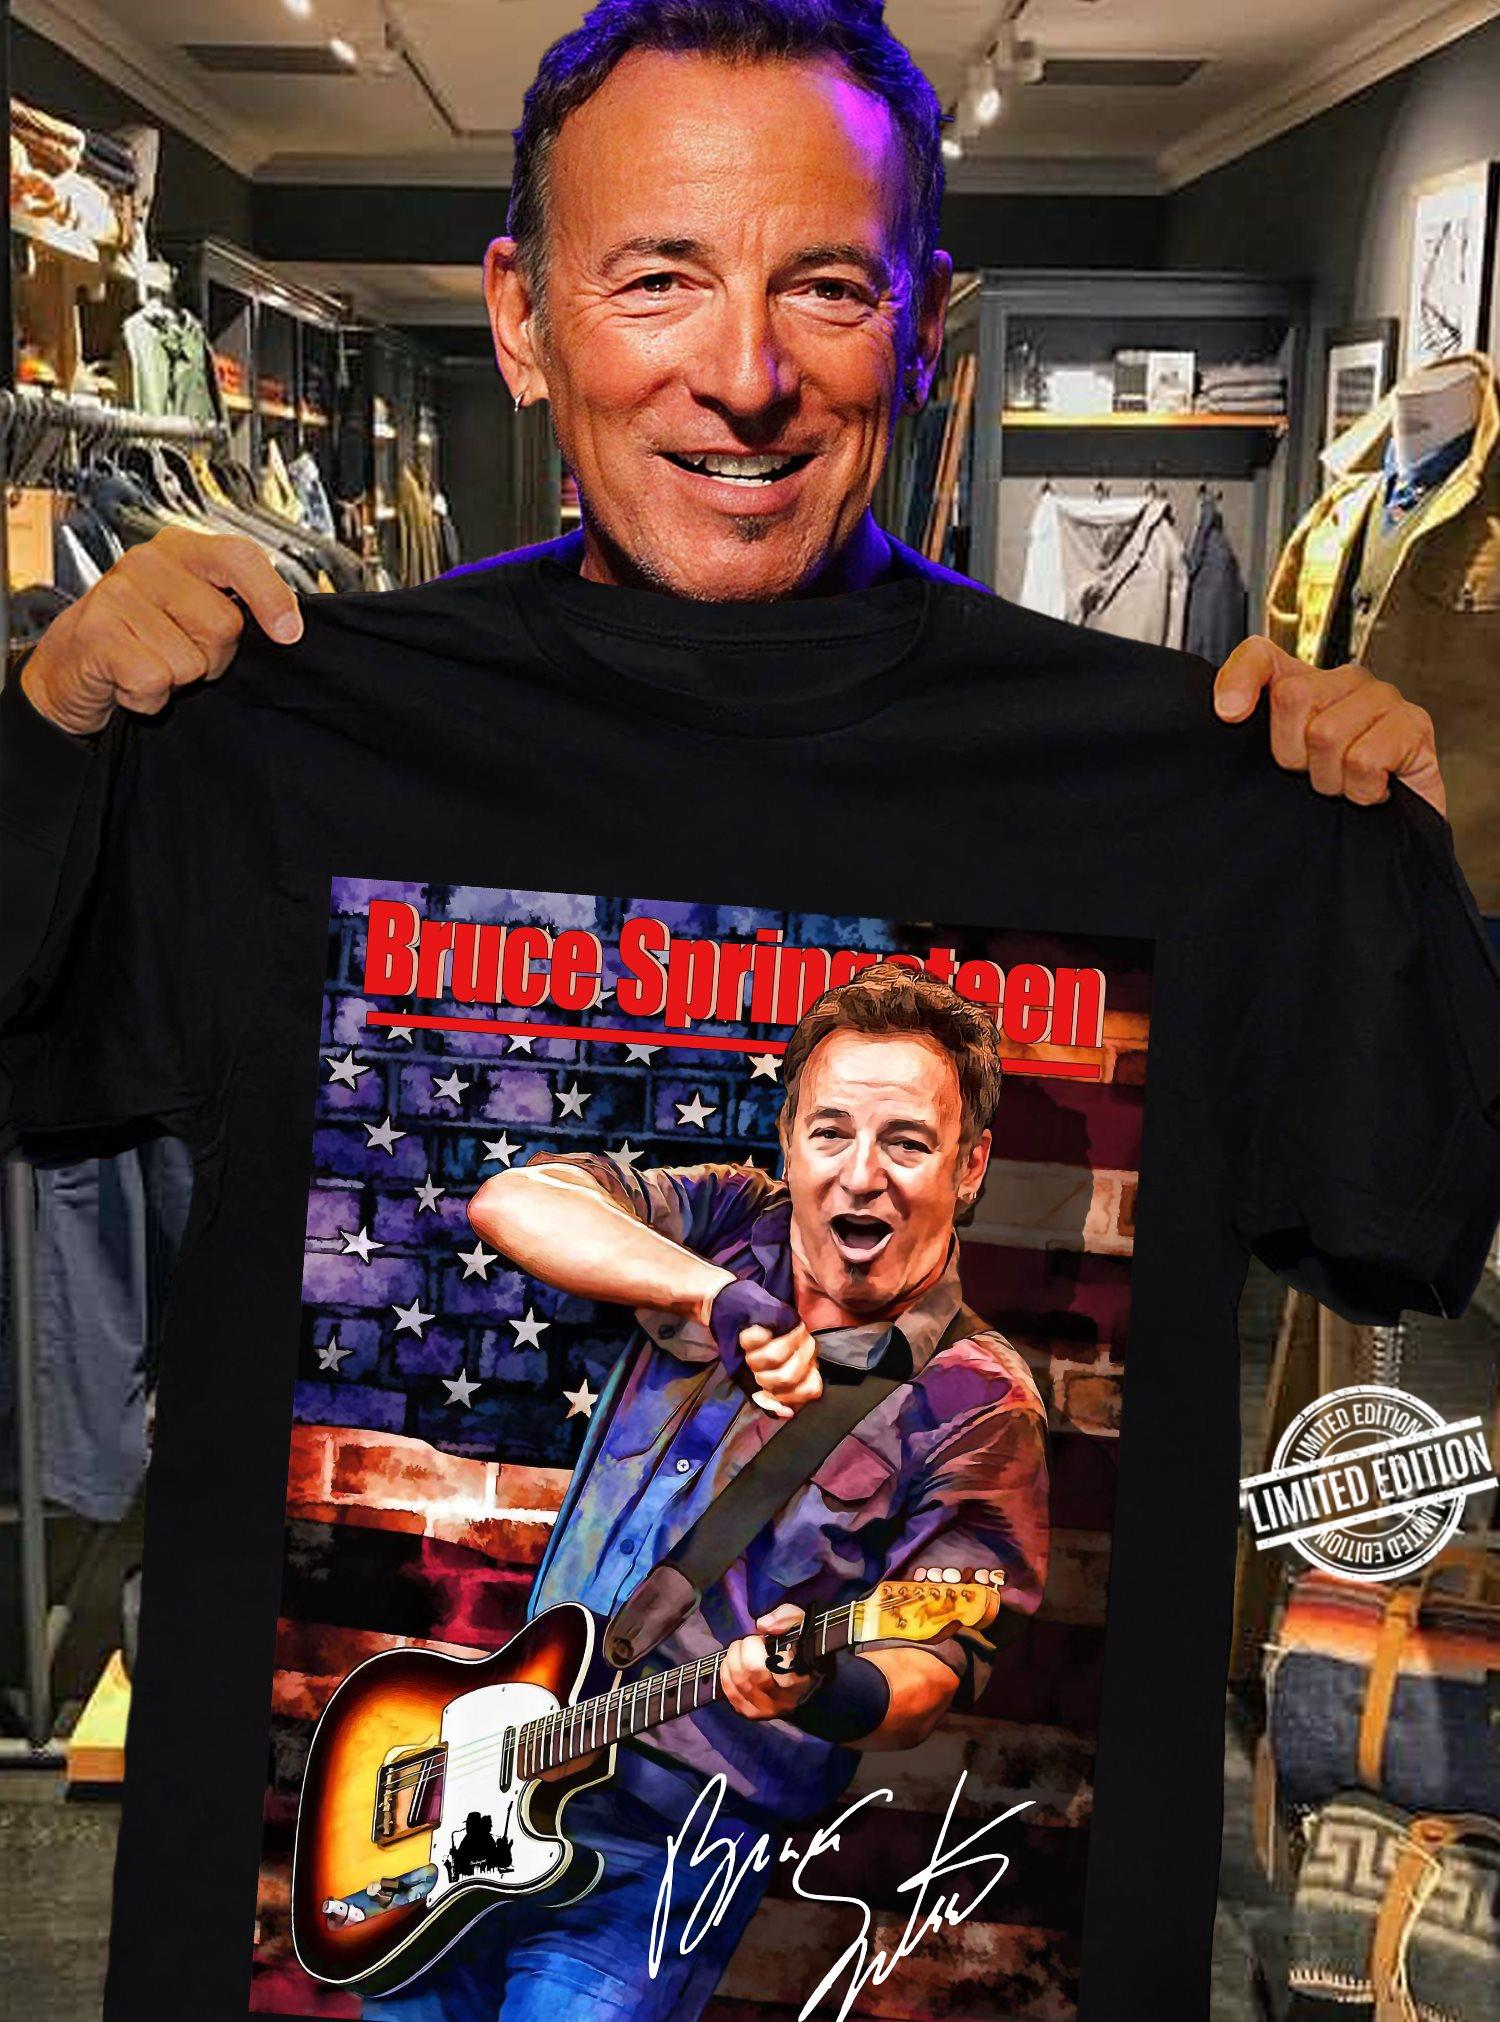 Bruce Springsteen Men T-Shirt